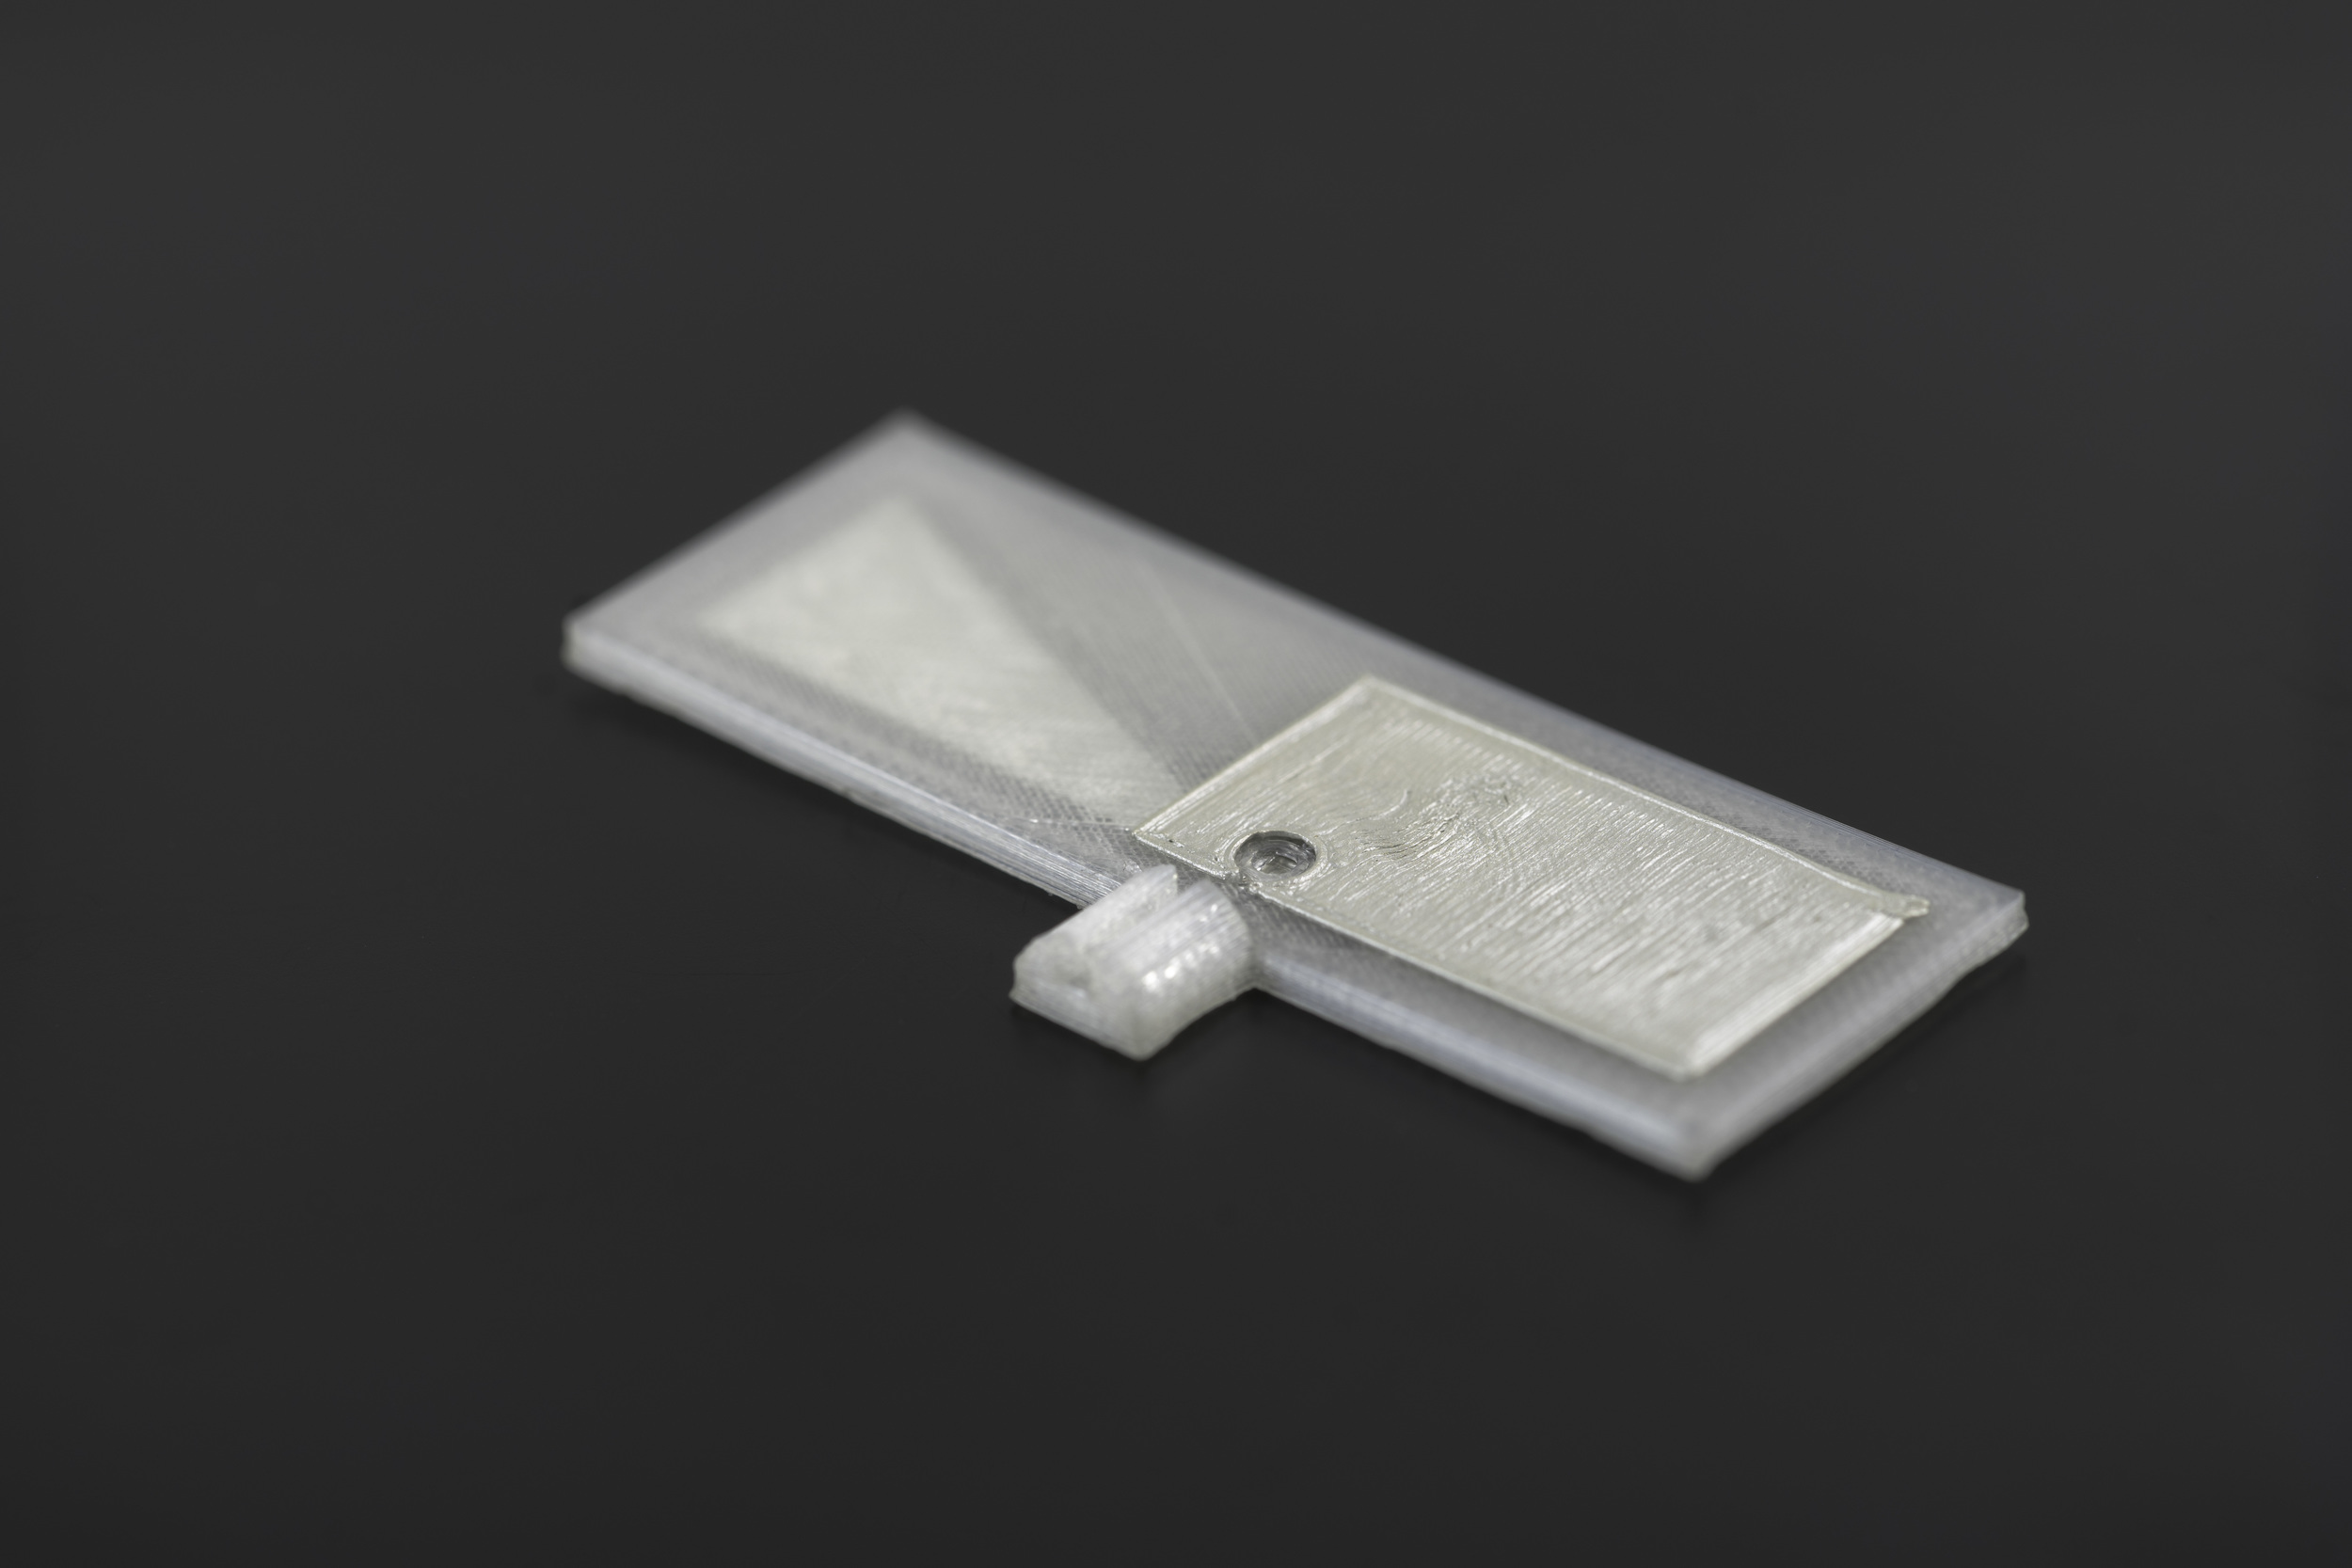 3D PRINTED 2.4 GHZ WIFI ANTENNA